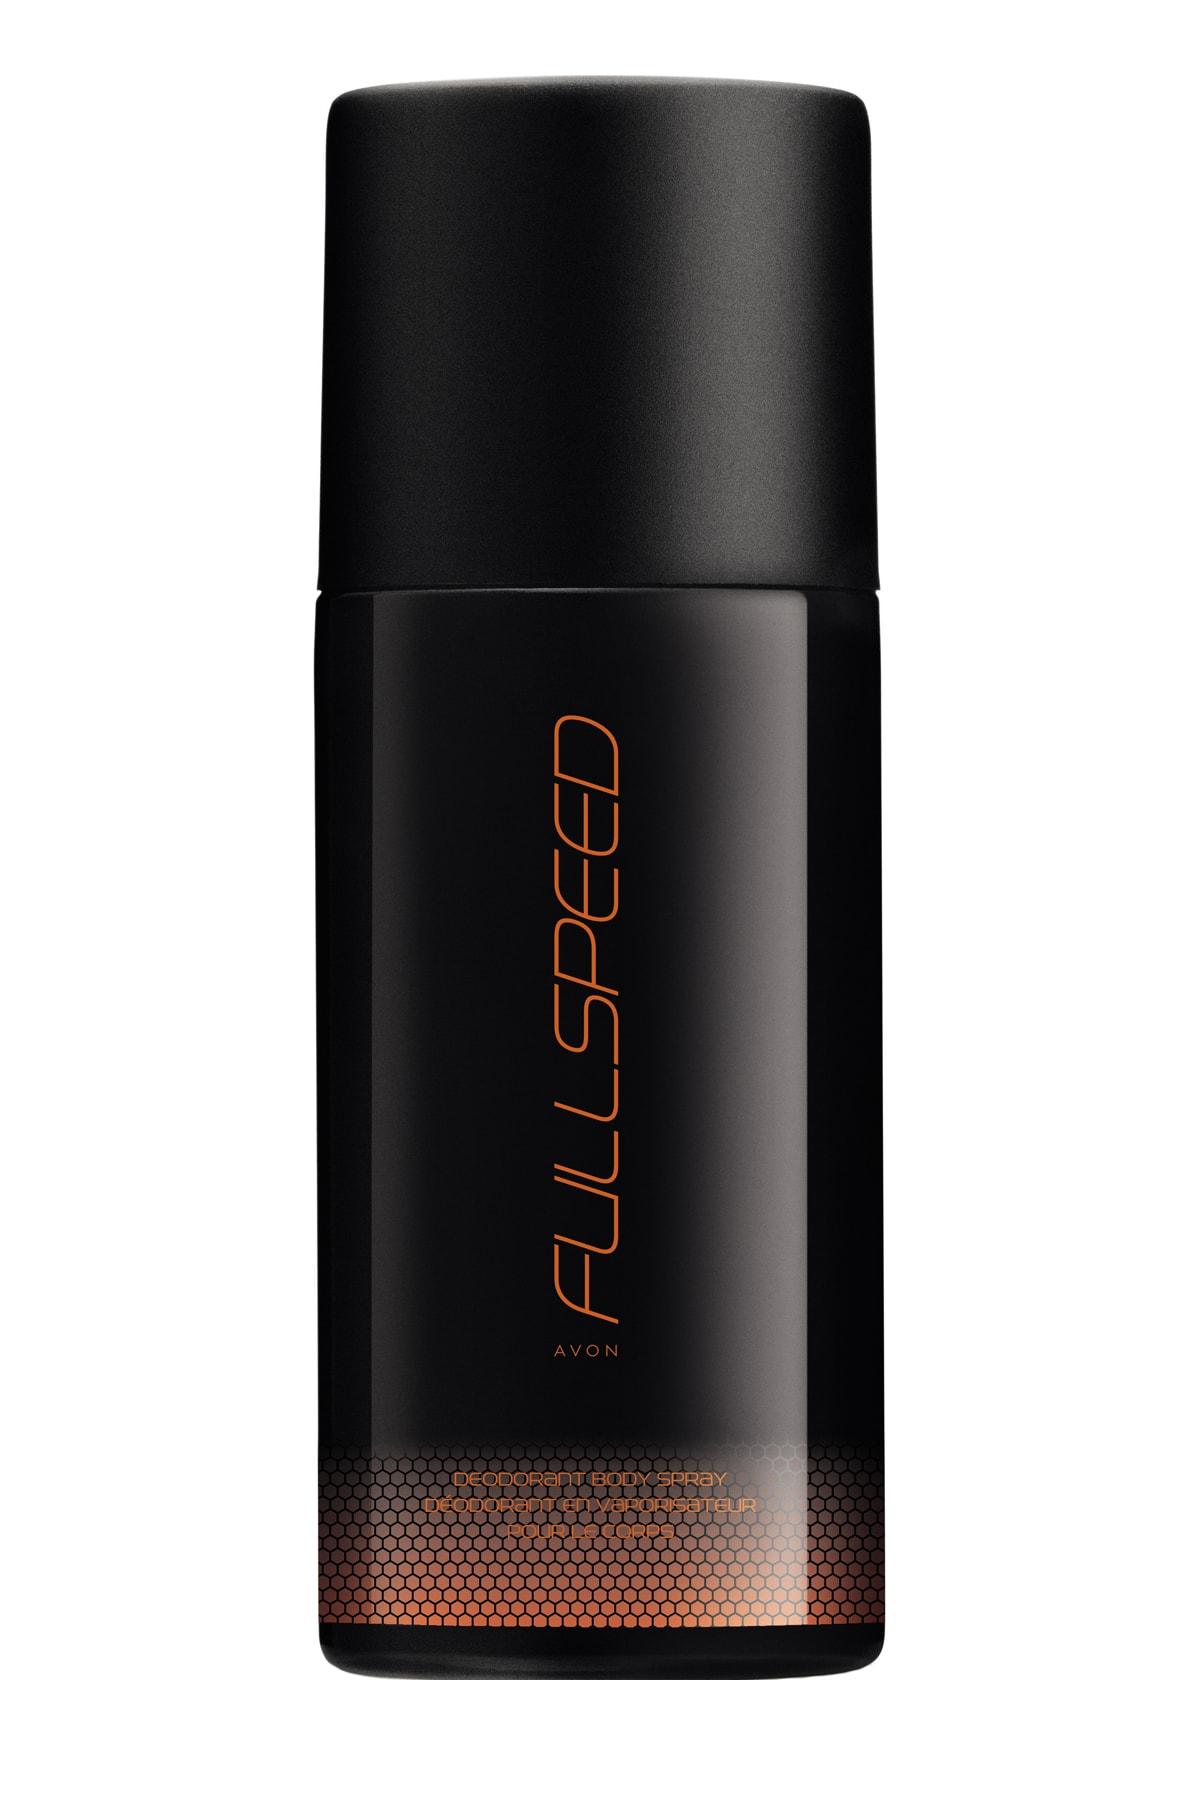 Avon Full Speed Erkek Deodorant 150 ml 8681298920021 0